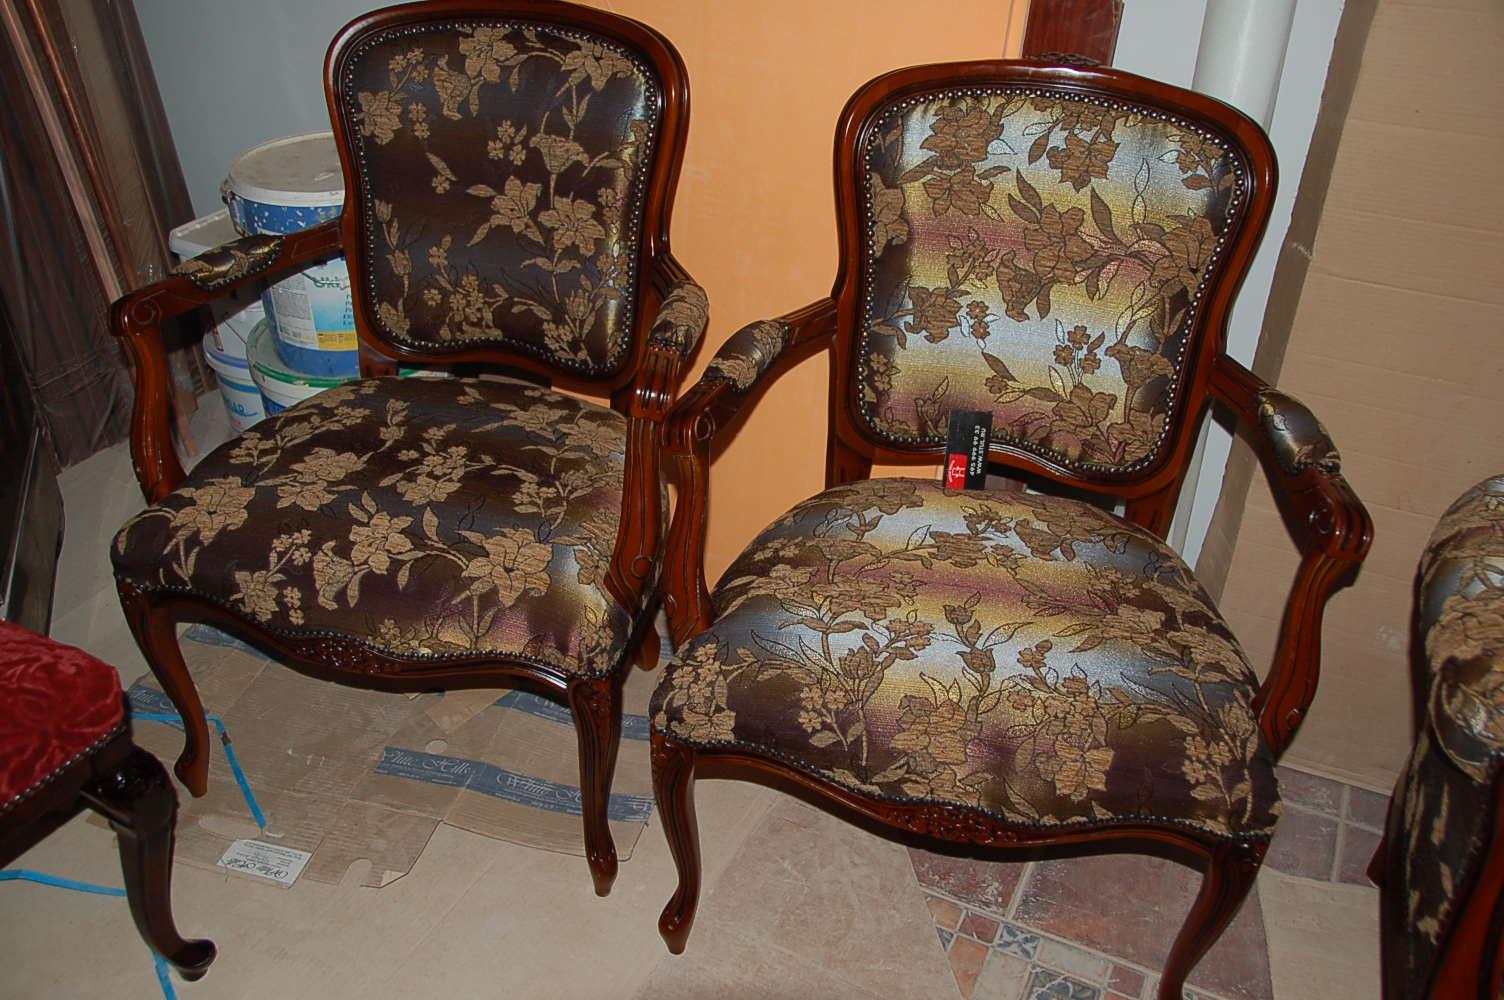 Upholstery- How to Diamond Tuft Мебель, Обивка и Мягкая 65